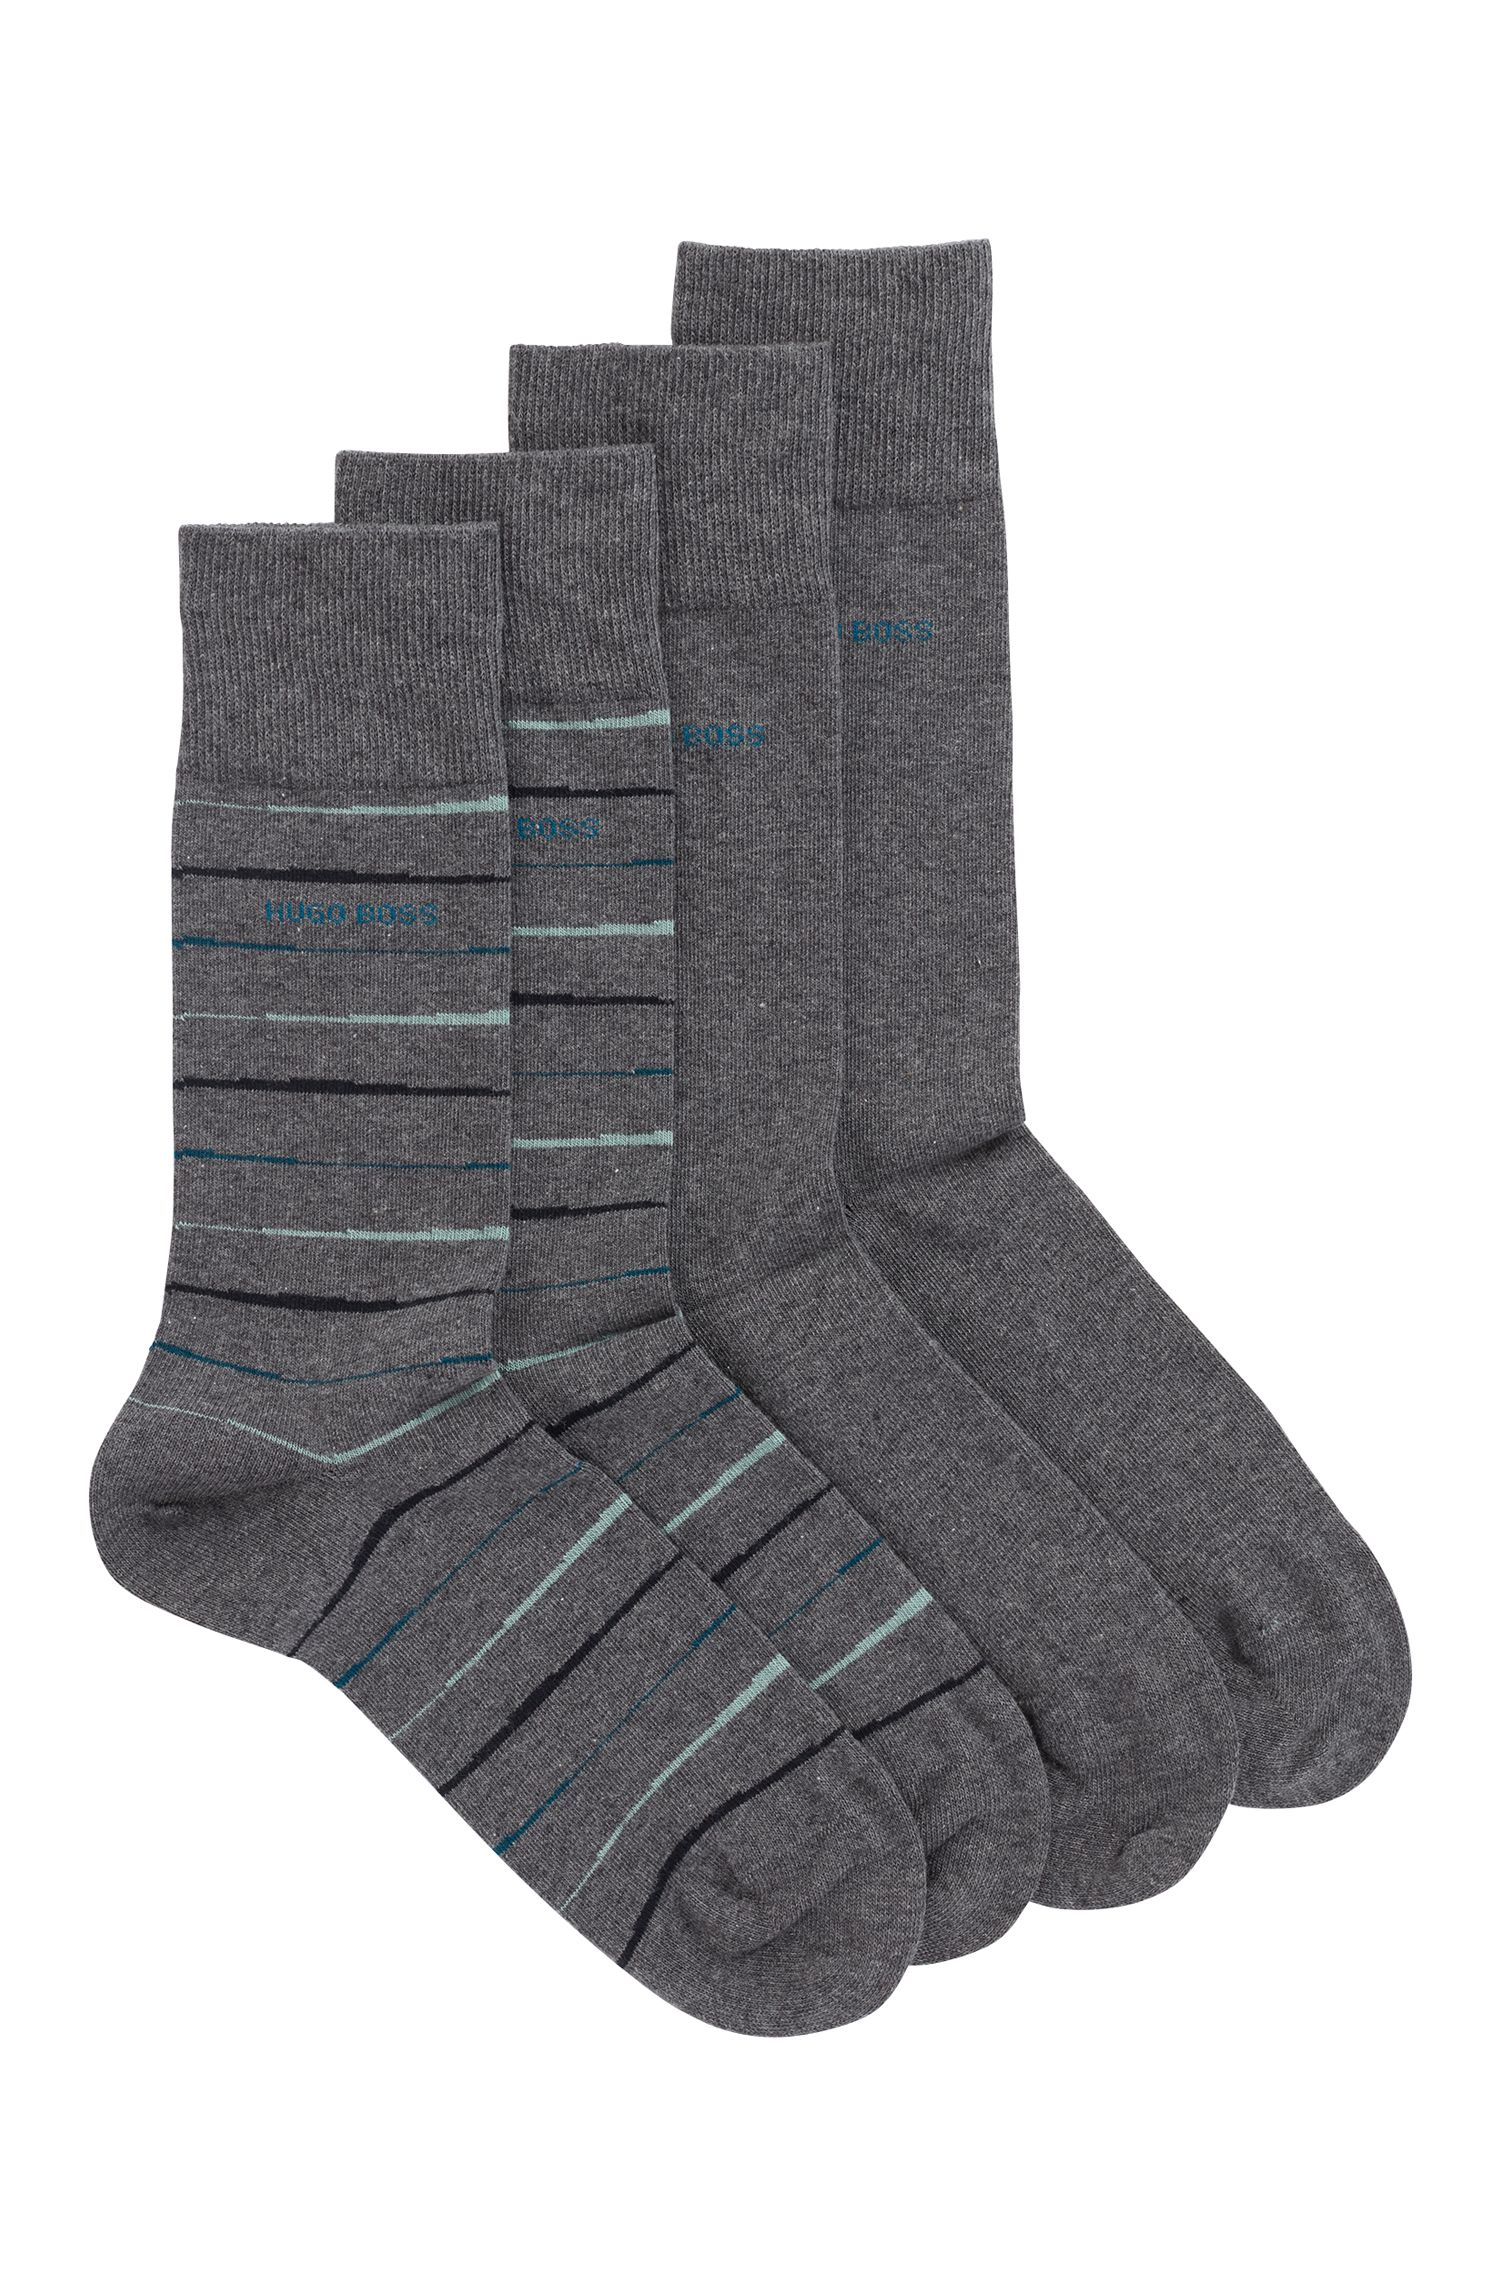 Set van twee paar sokken in standaardlengte met gekamde afwerking, Grijs